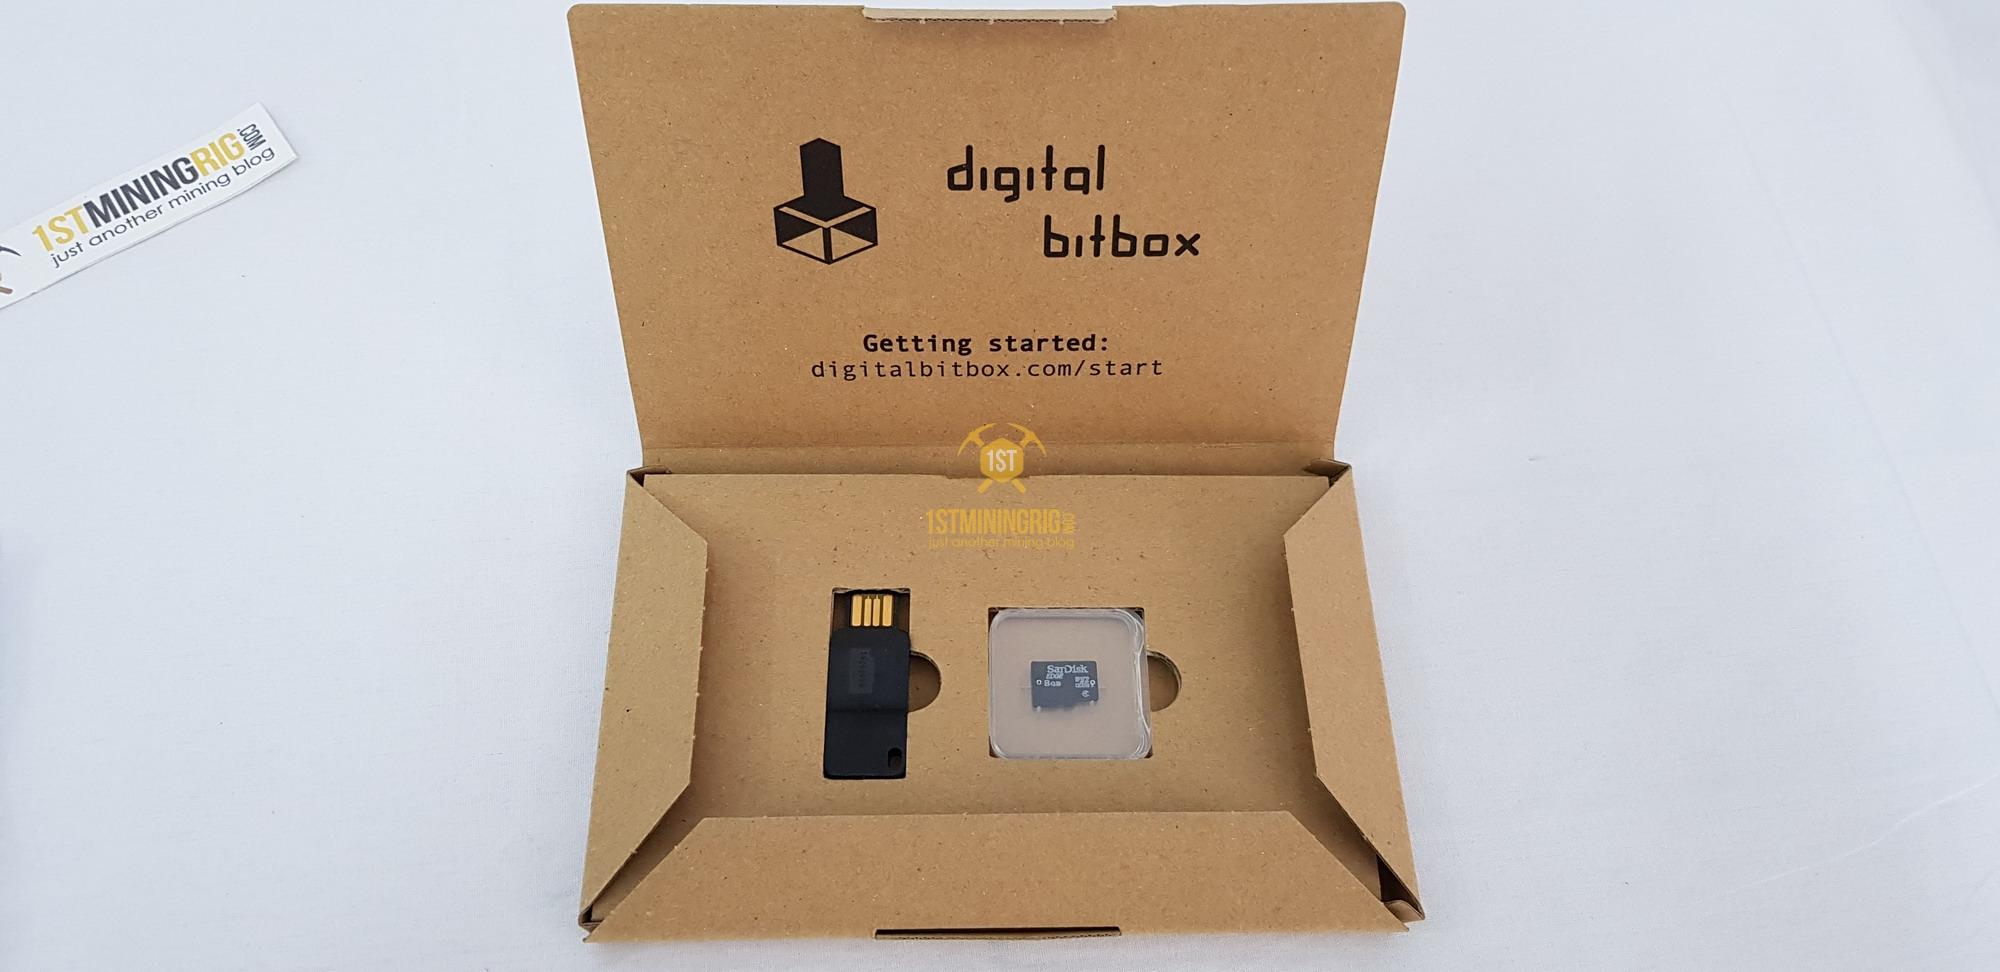 Digital bitbox cryptocurrency hardware wallet